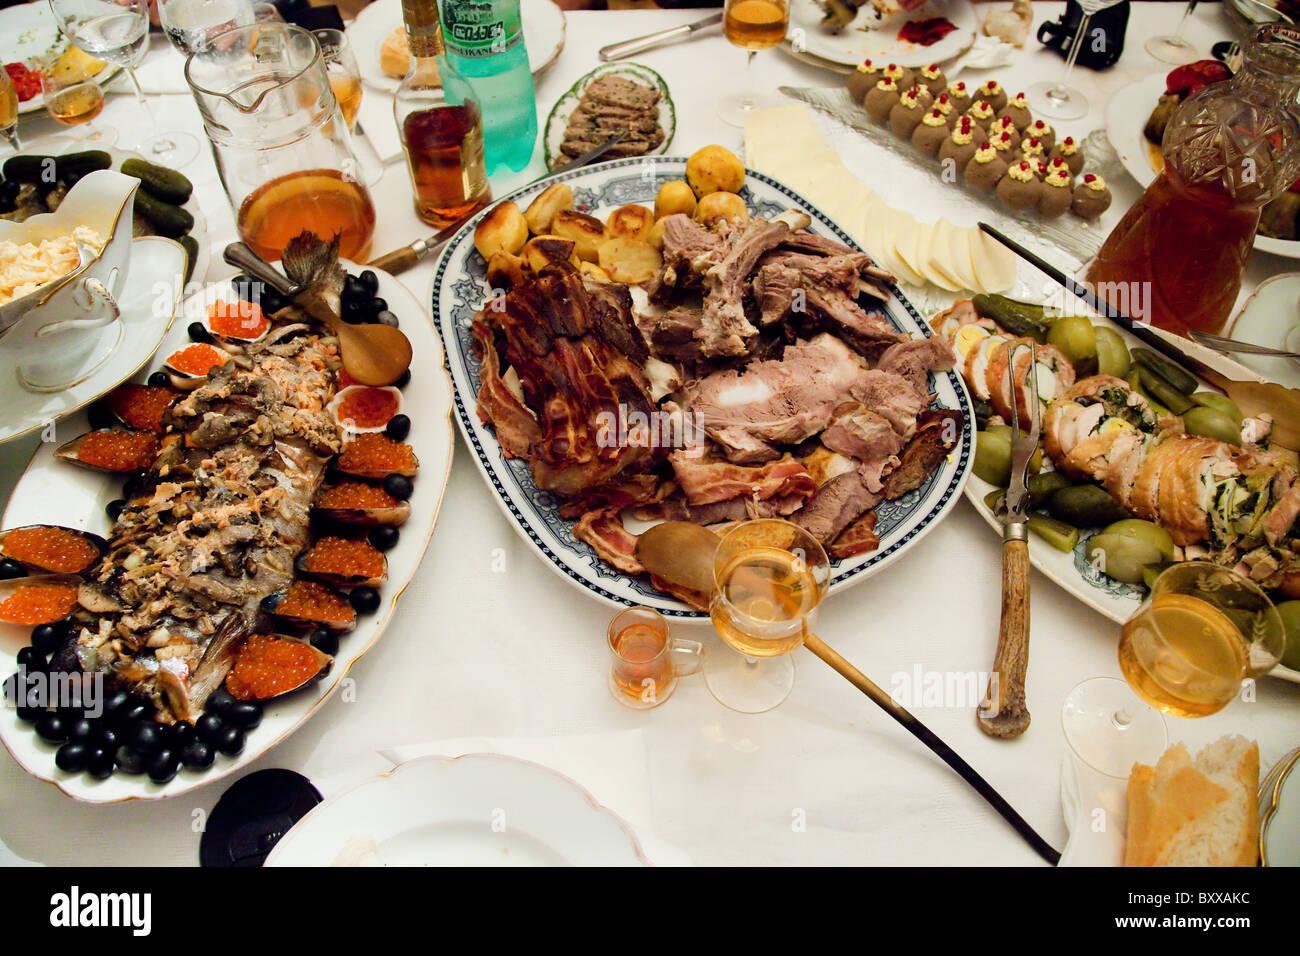 Georgian feast of many dinner dishes including caviar in Tbilisi Georgia. JMH4091 - Stock Image